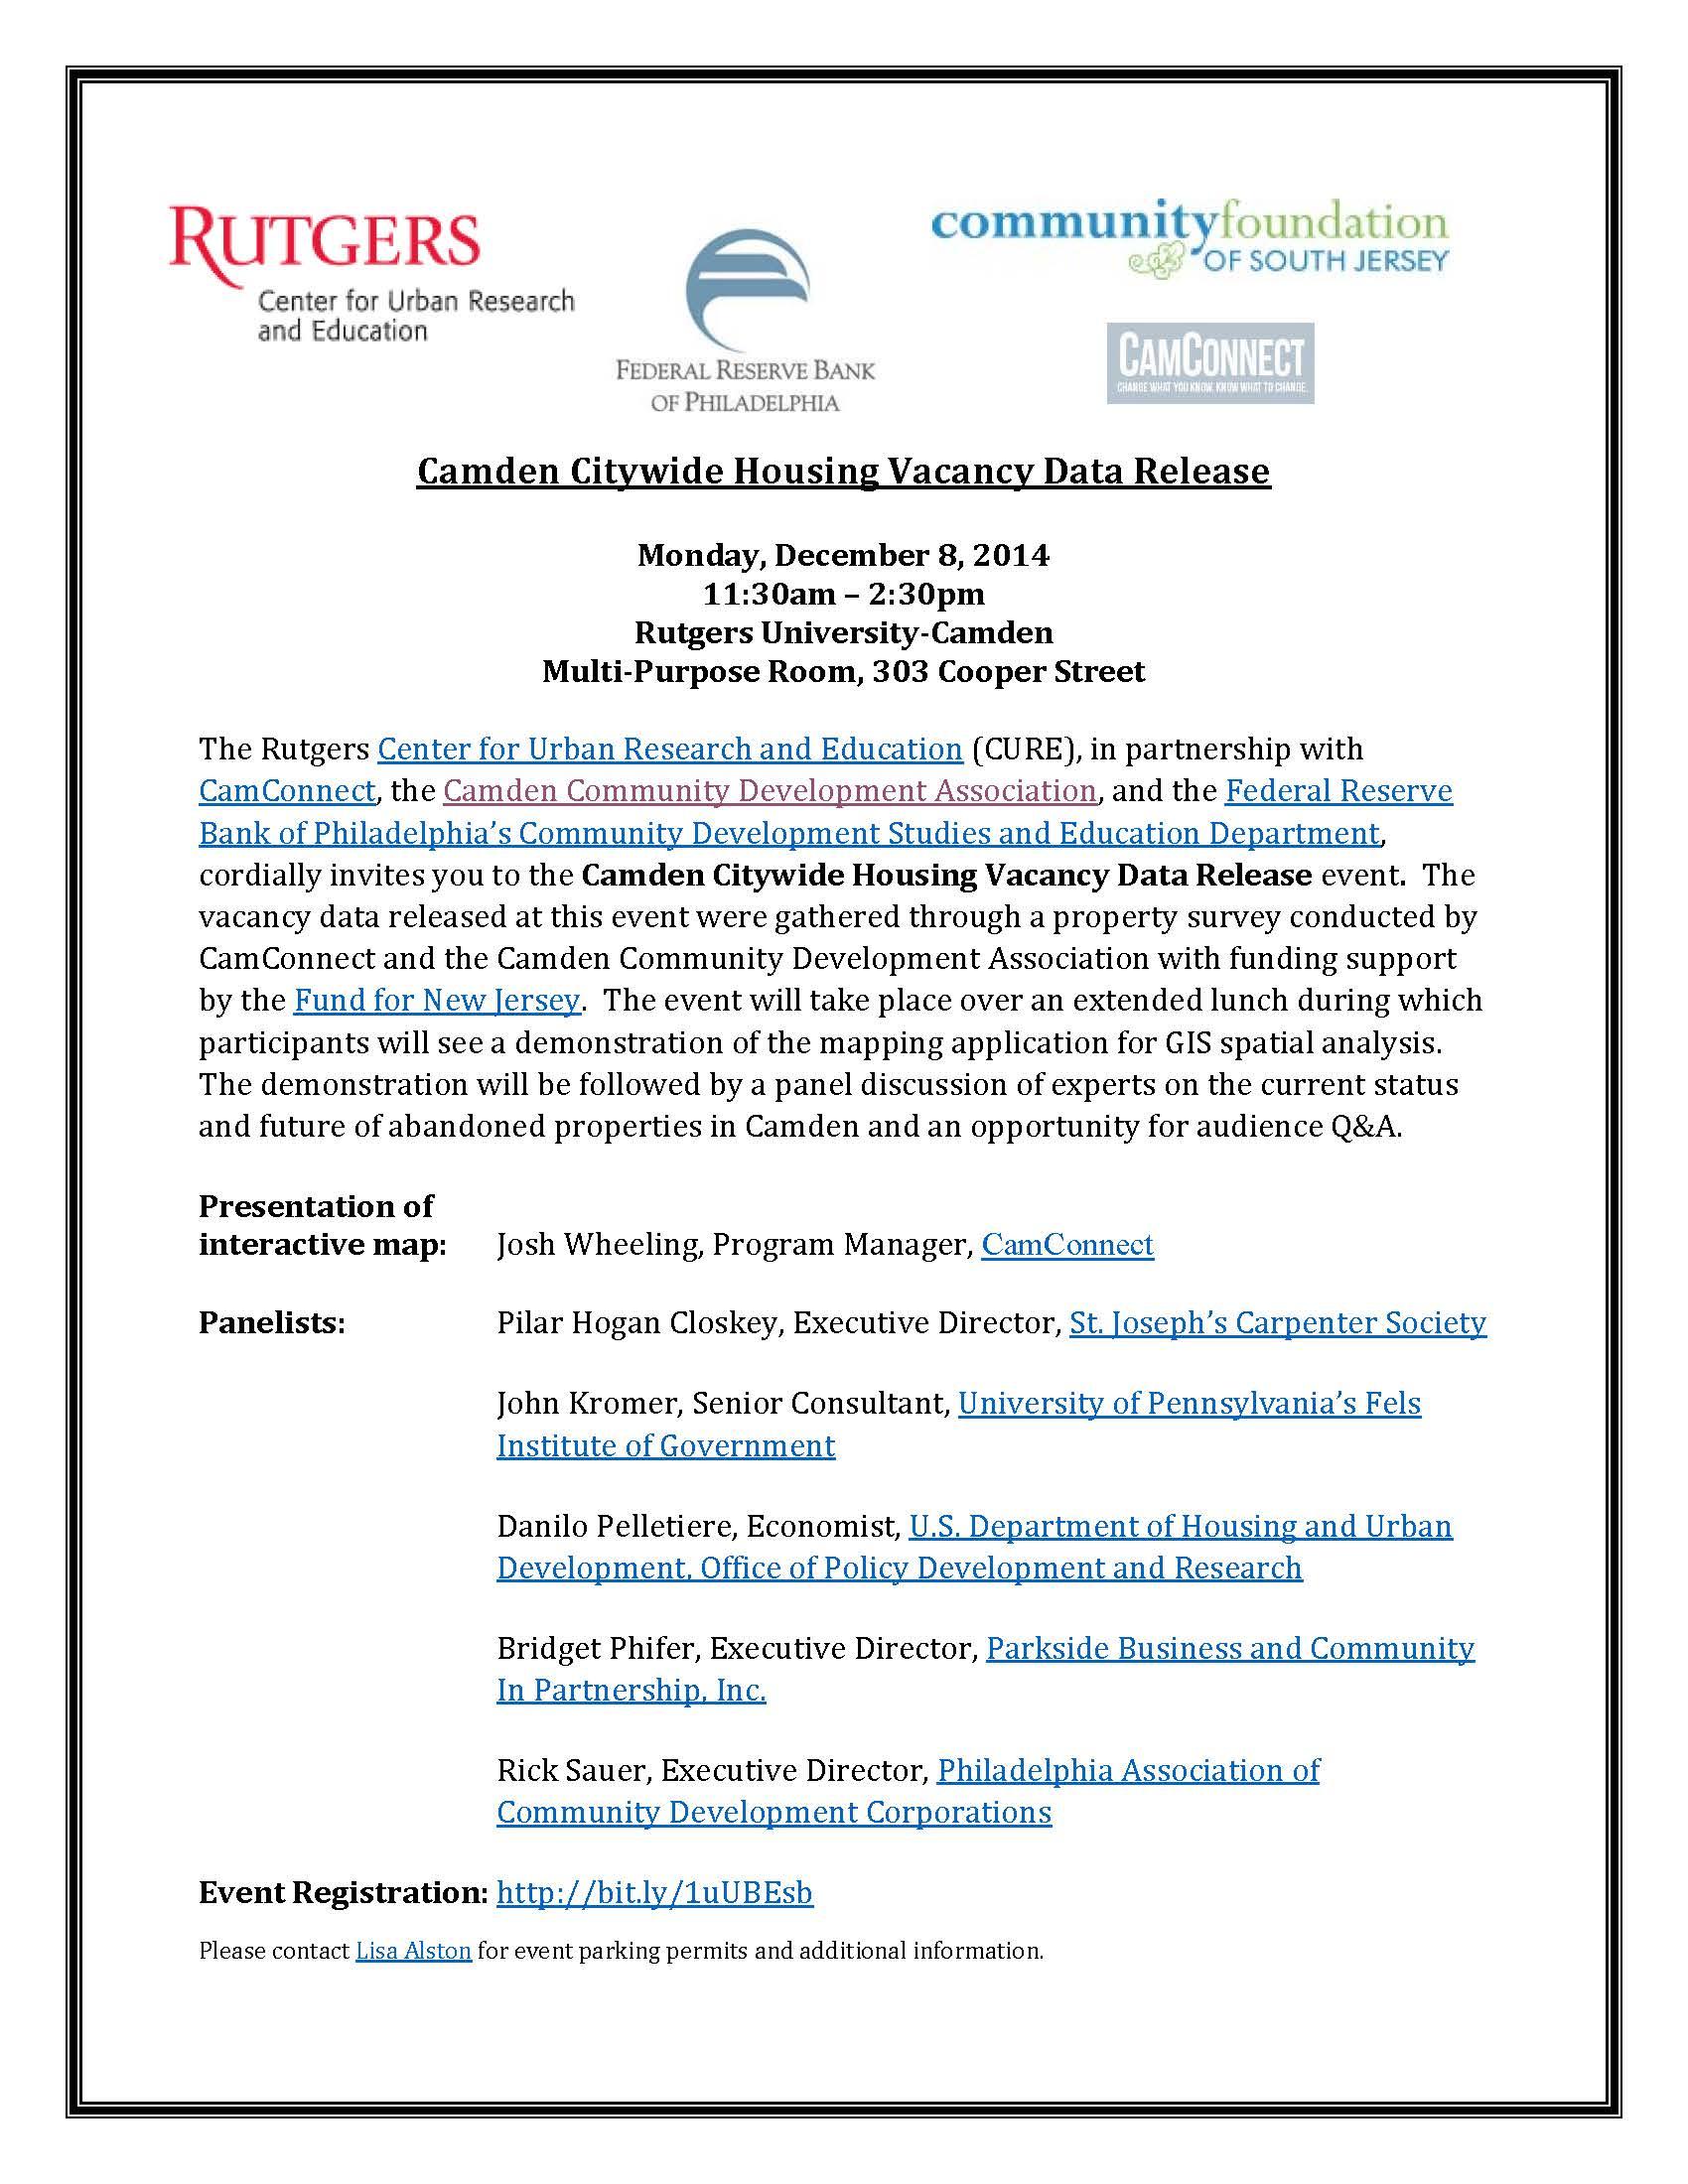 Camden Citywide Housing Vacancy Data Release event